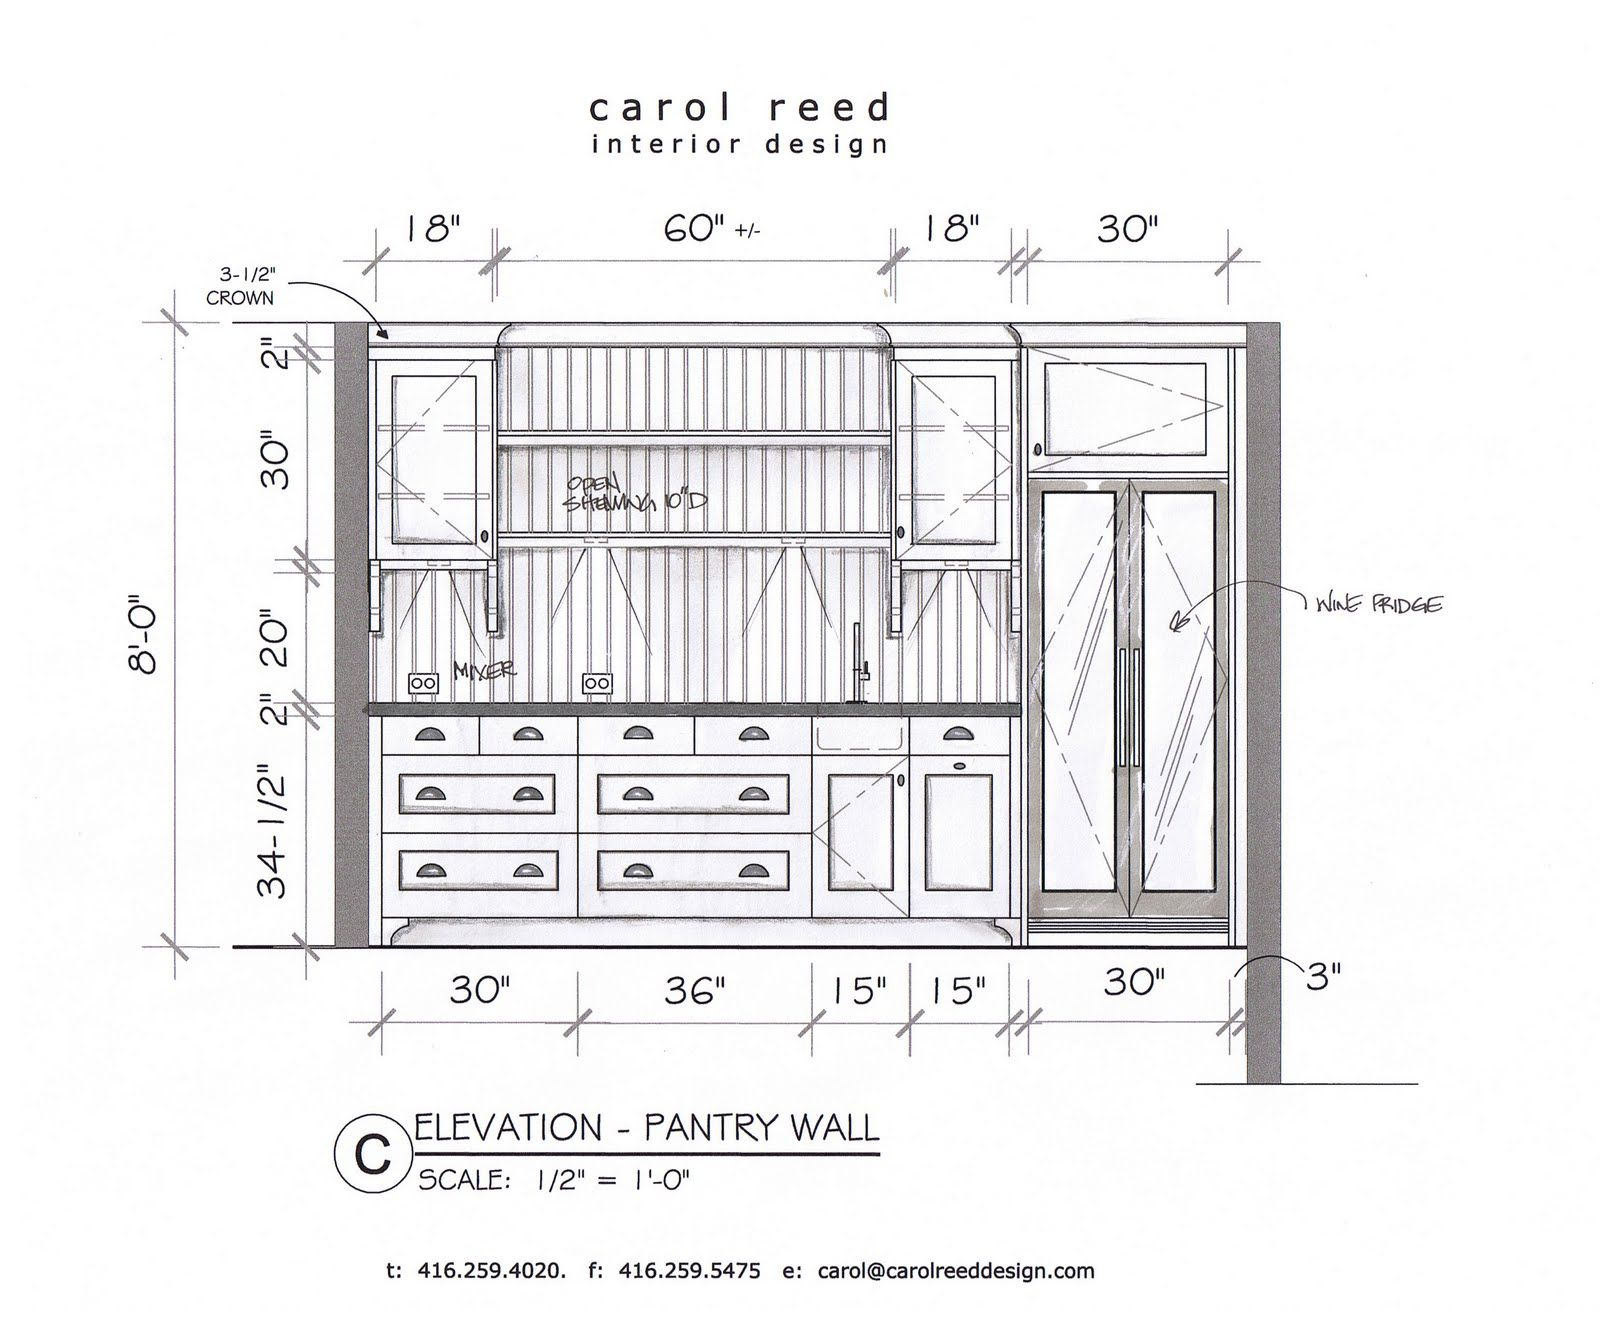 Cadkitchenplans com millwork shop drawings cabinet shop drawings - Kitchen Pantries